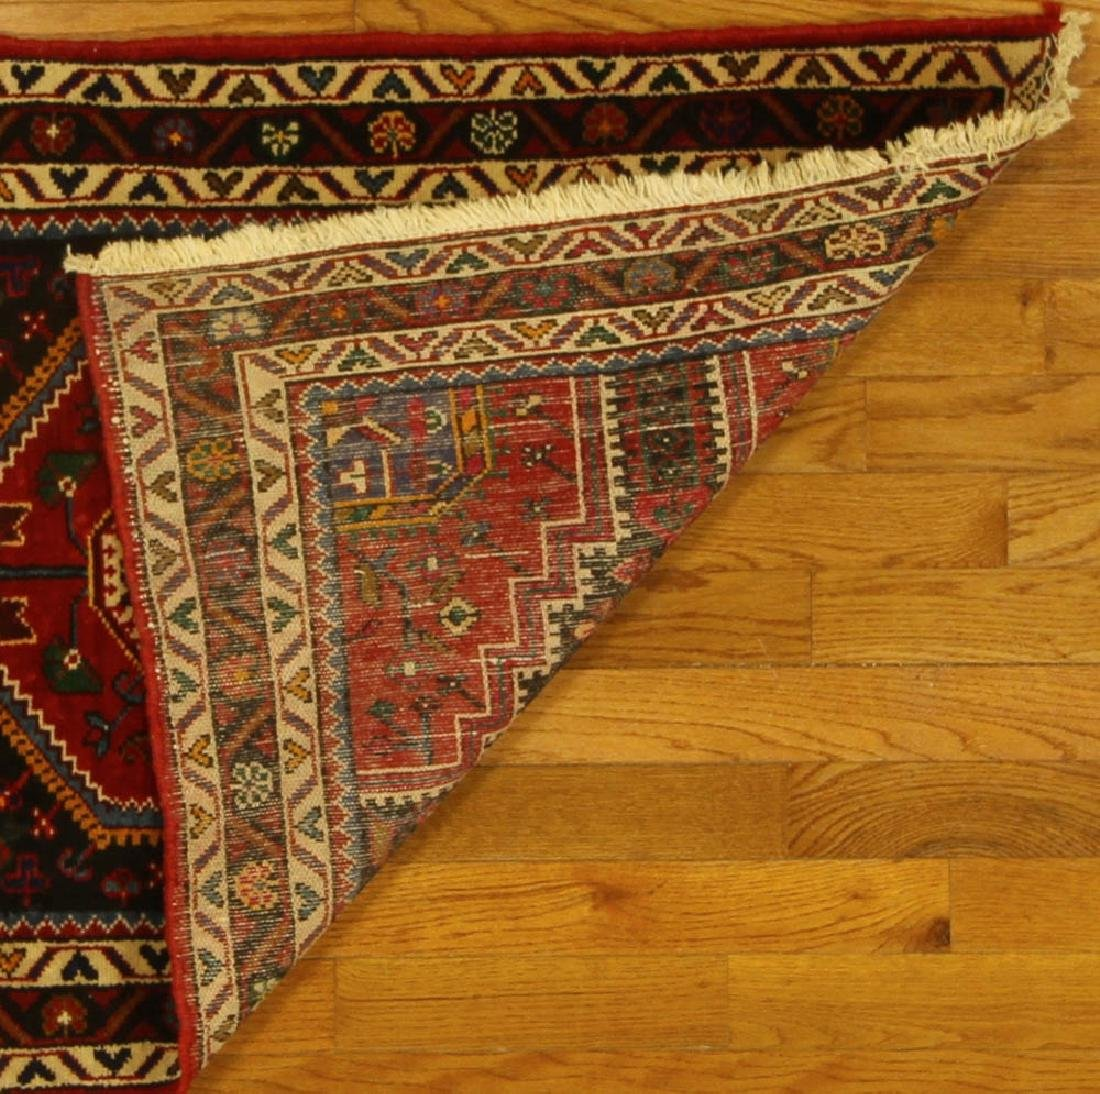 Semi-antique Persian Tribal Rug - 5